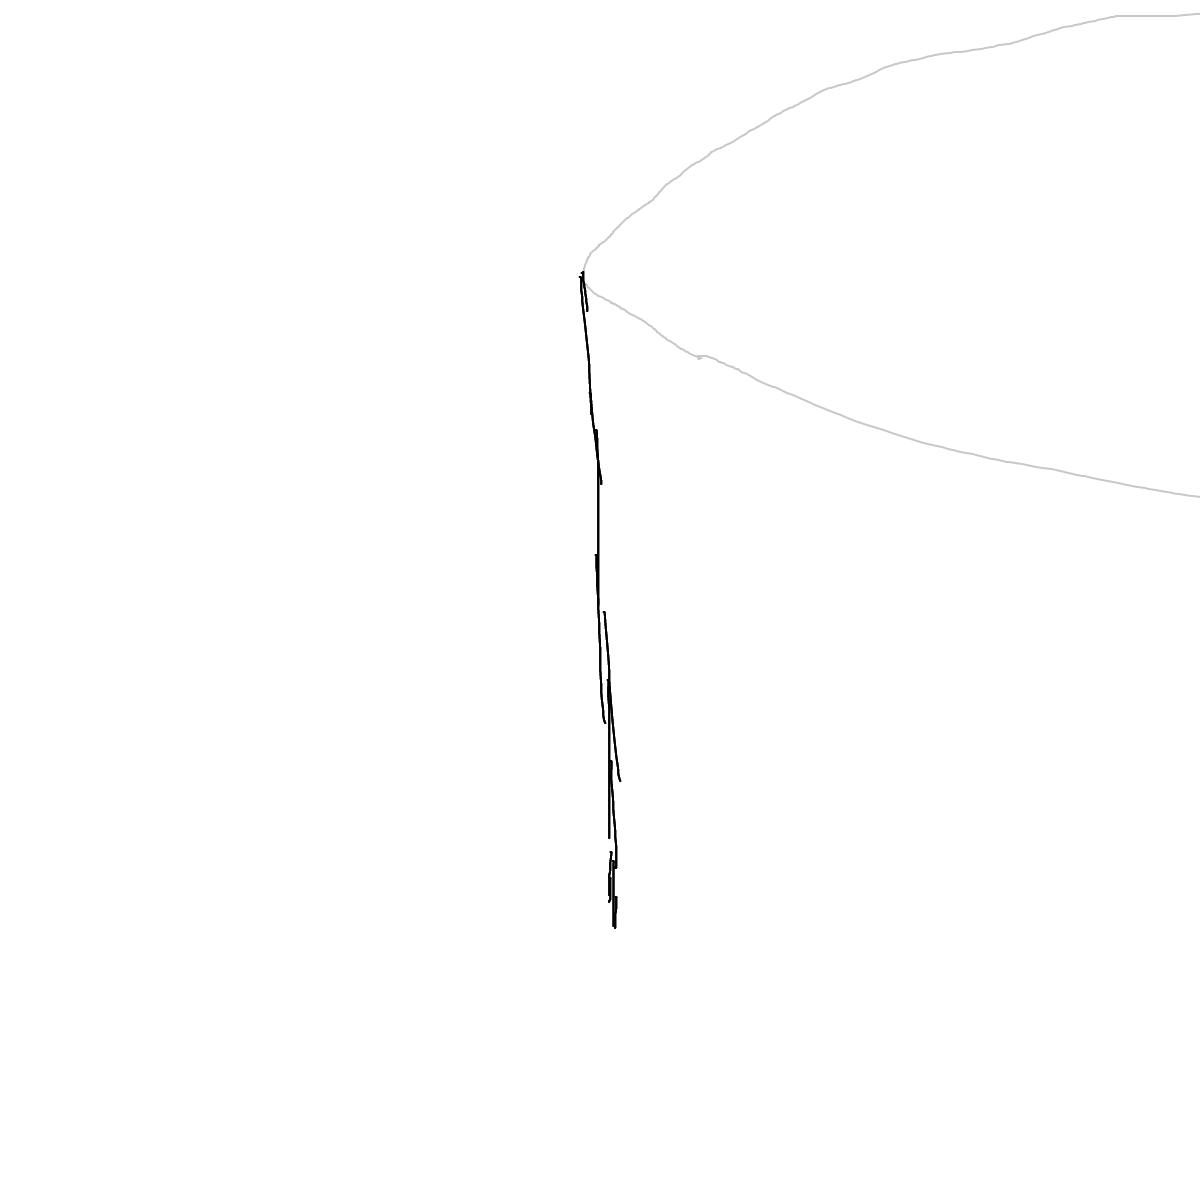 BAAAM drawing#2497 lat:52.0848922729492200lng: 5.1688427925109860